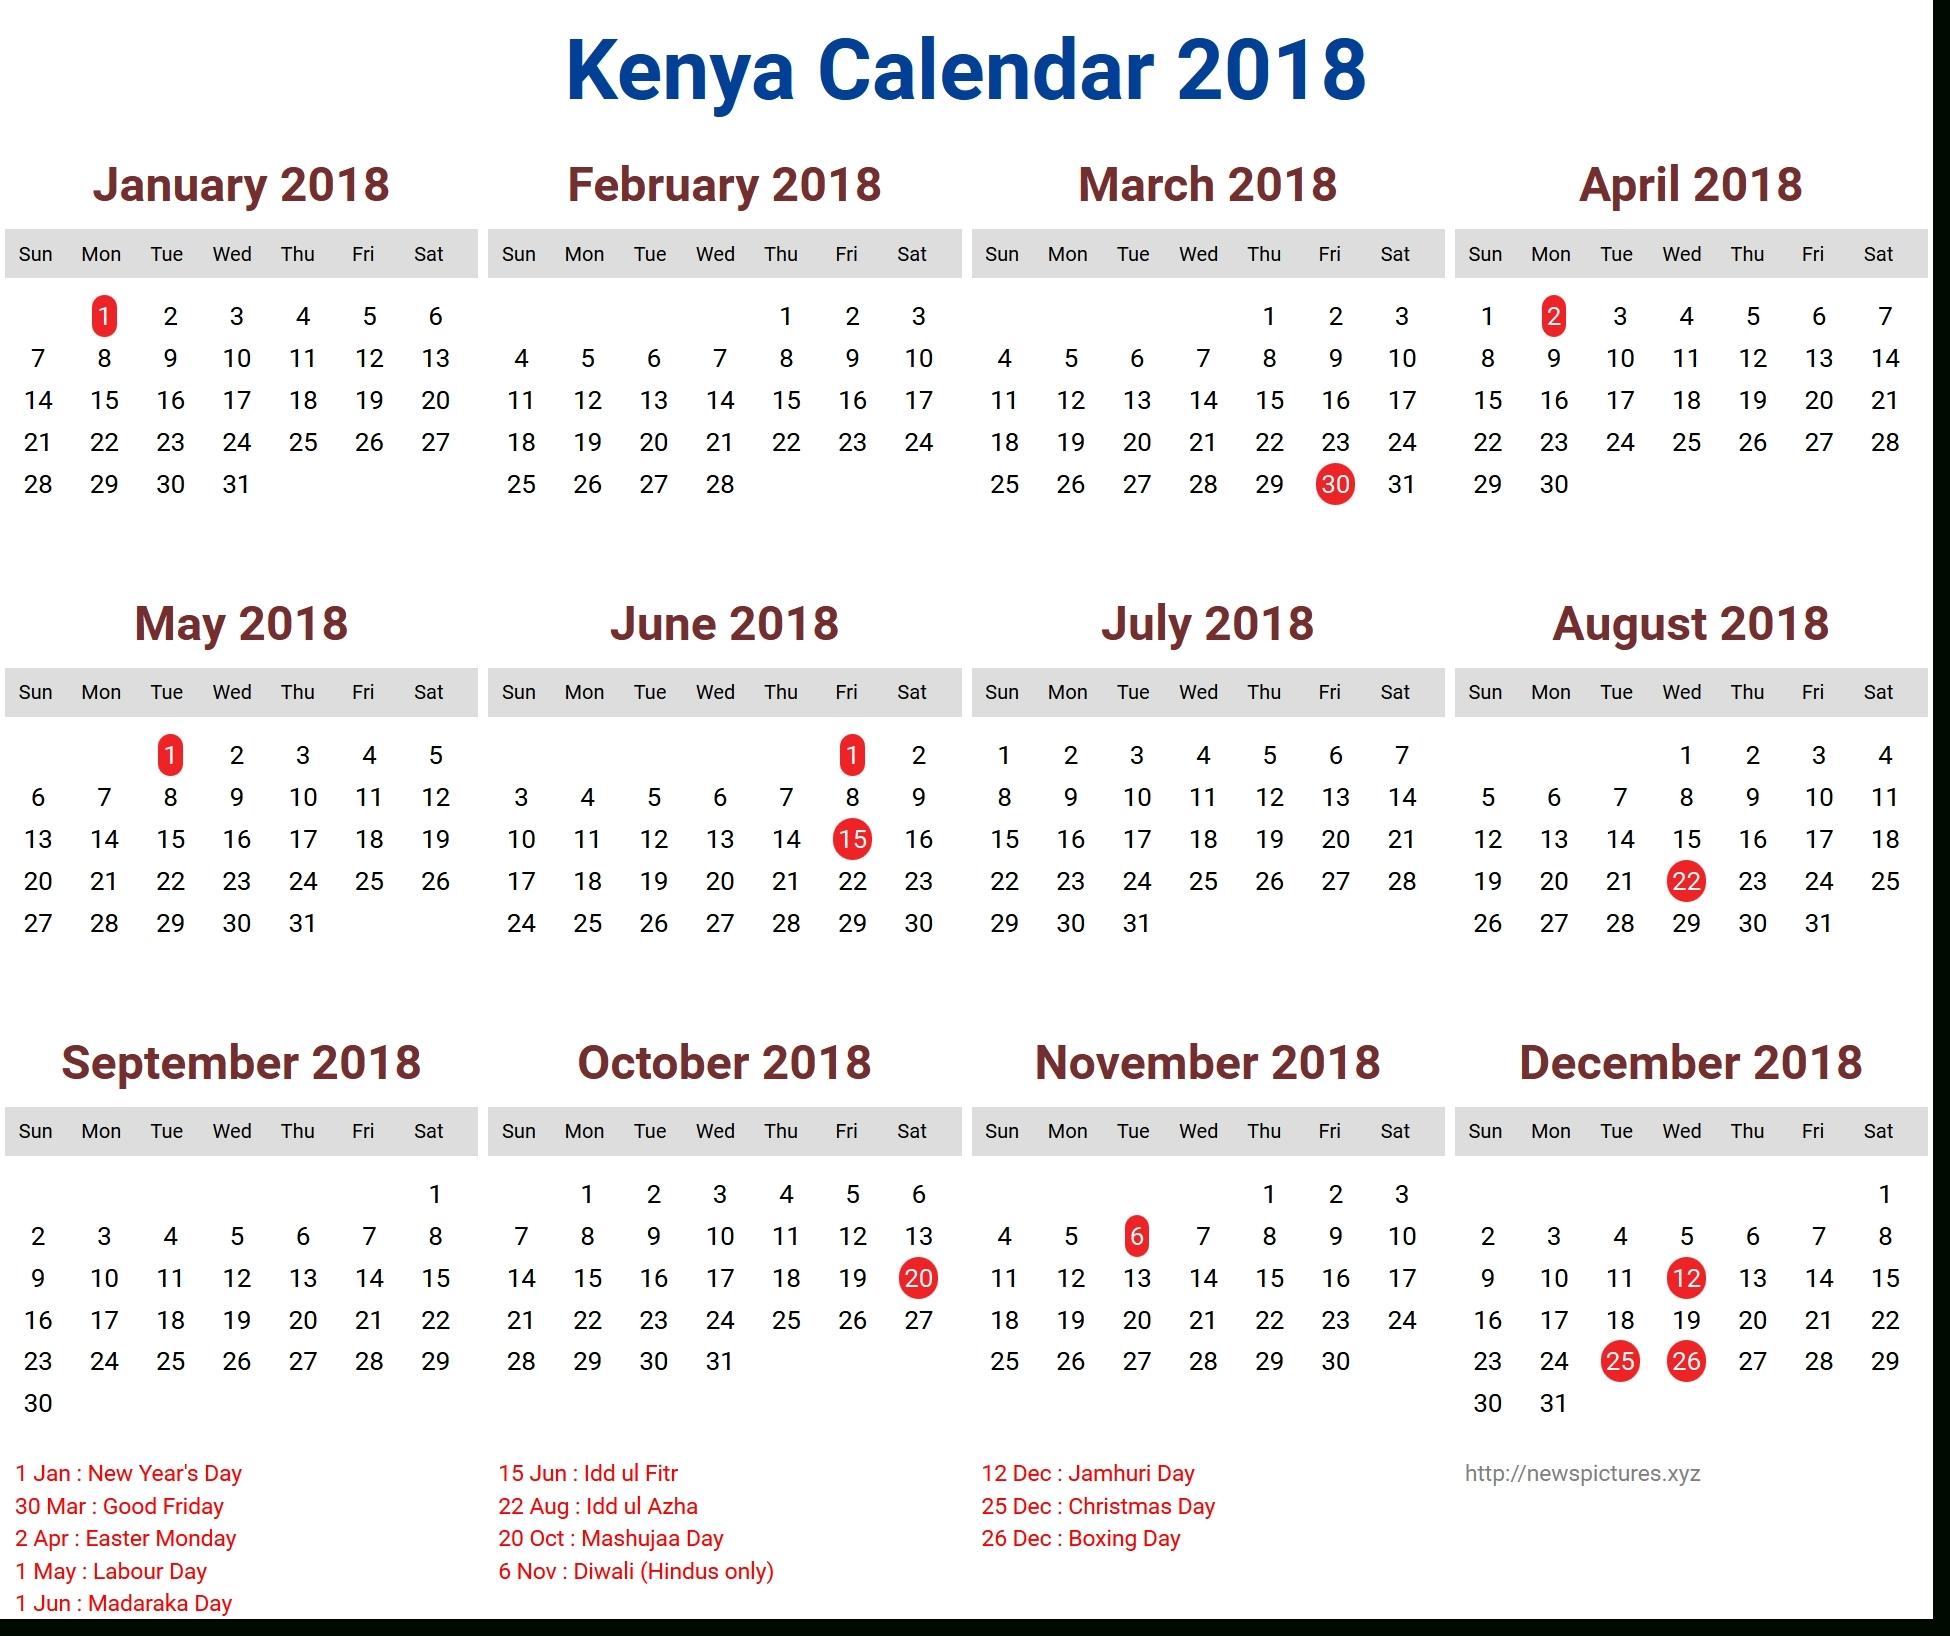 2018 Calendar With Kenya Holidays – Template Calendar Design Calendar Holidays In Kenya